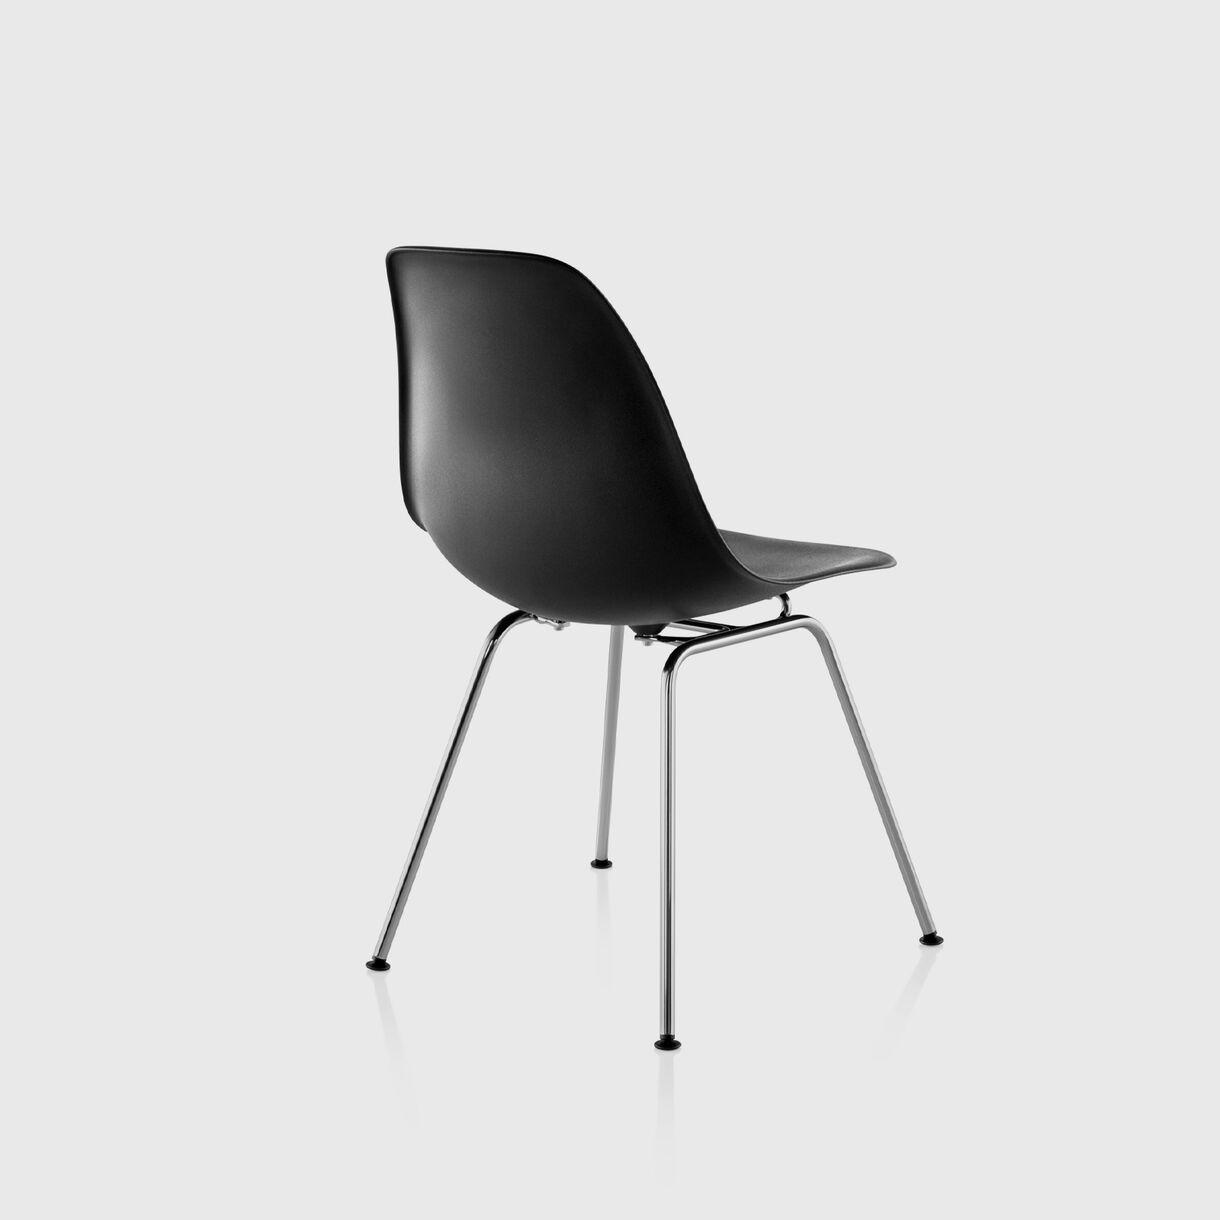 Eames Moulded Plastic Side Chair 4-Leg, Black, Chrome